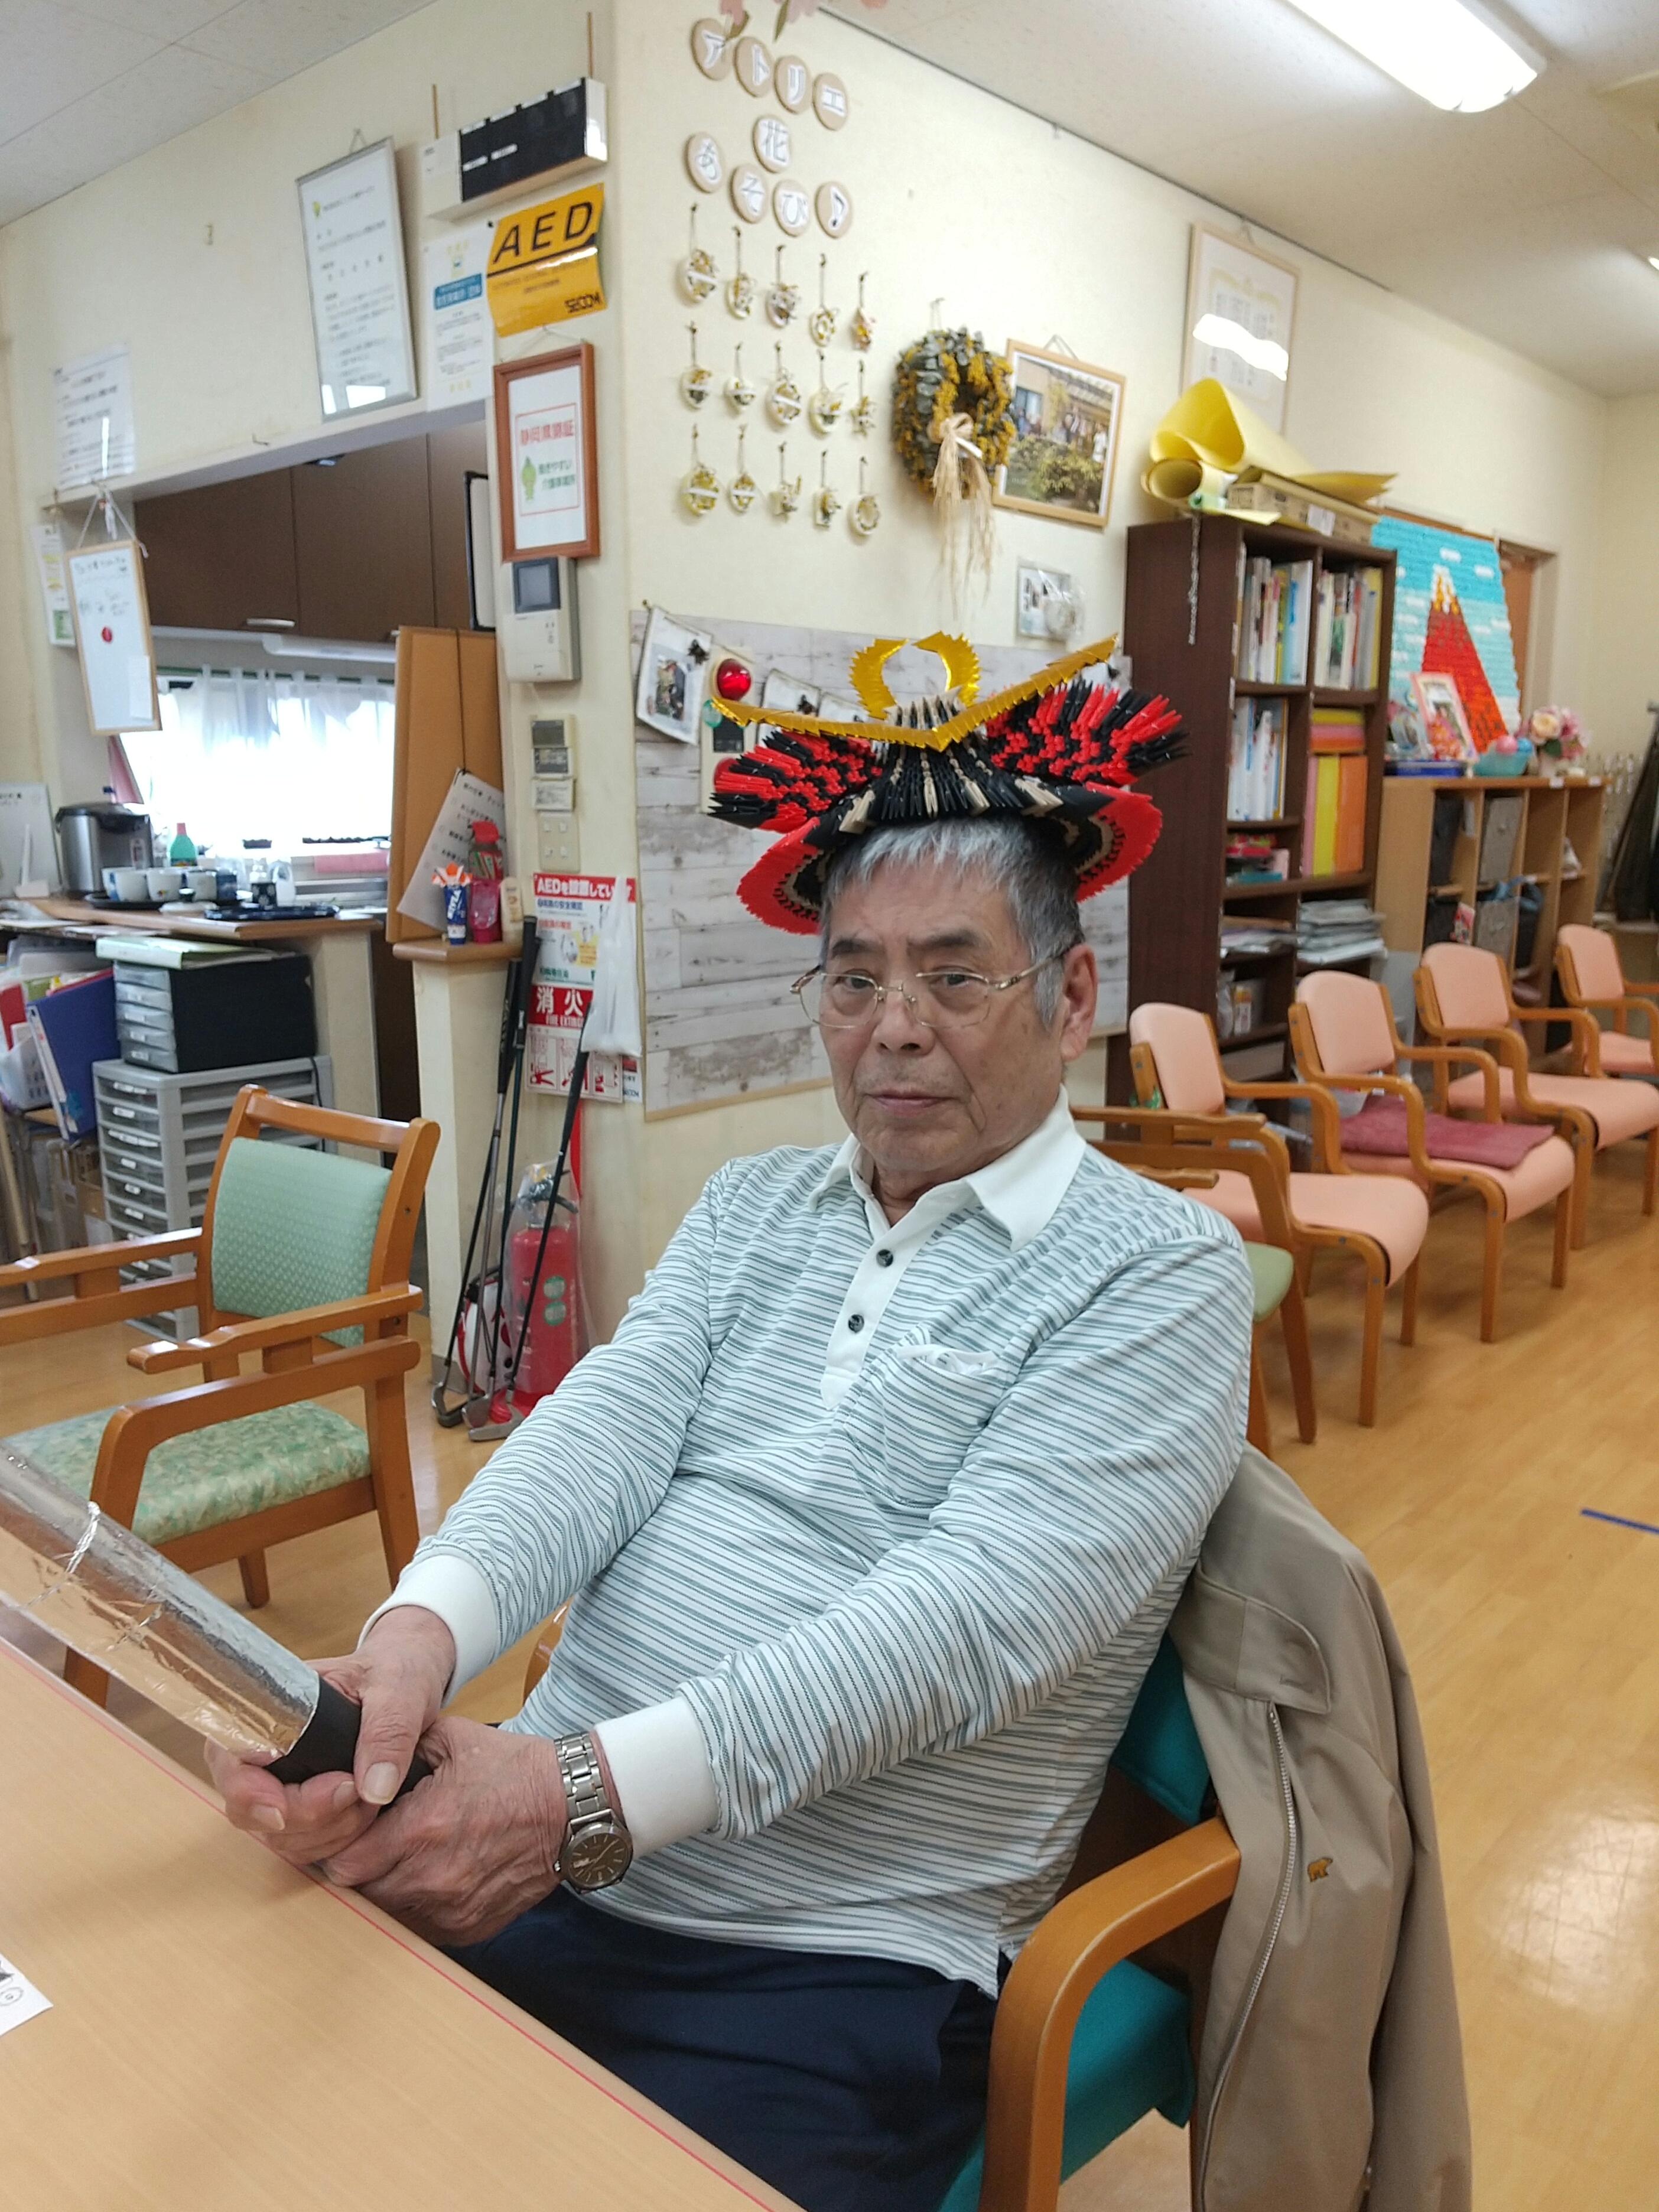 https://blog.magokorokaigo.com/staffblog/fujieda-dy/HORIZON_0002_BURST20210505143719174.JPG